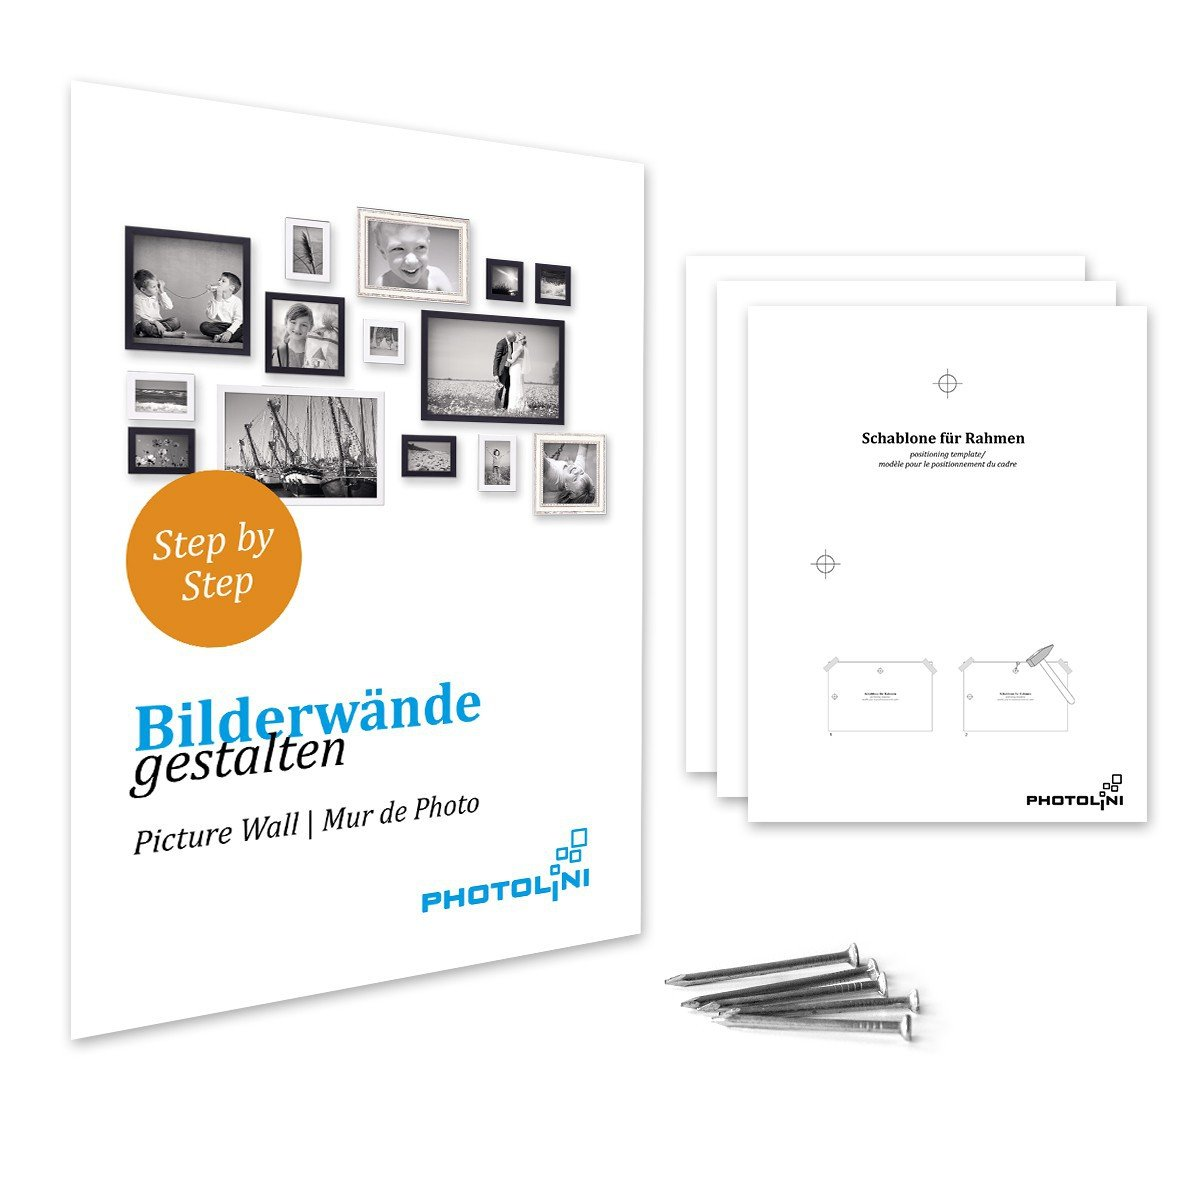 Amazon.de: PHOTOLINI Bilderrahmen 21x30 cm/DIN A4 Weiss Modern aus ...